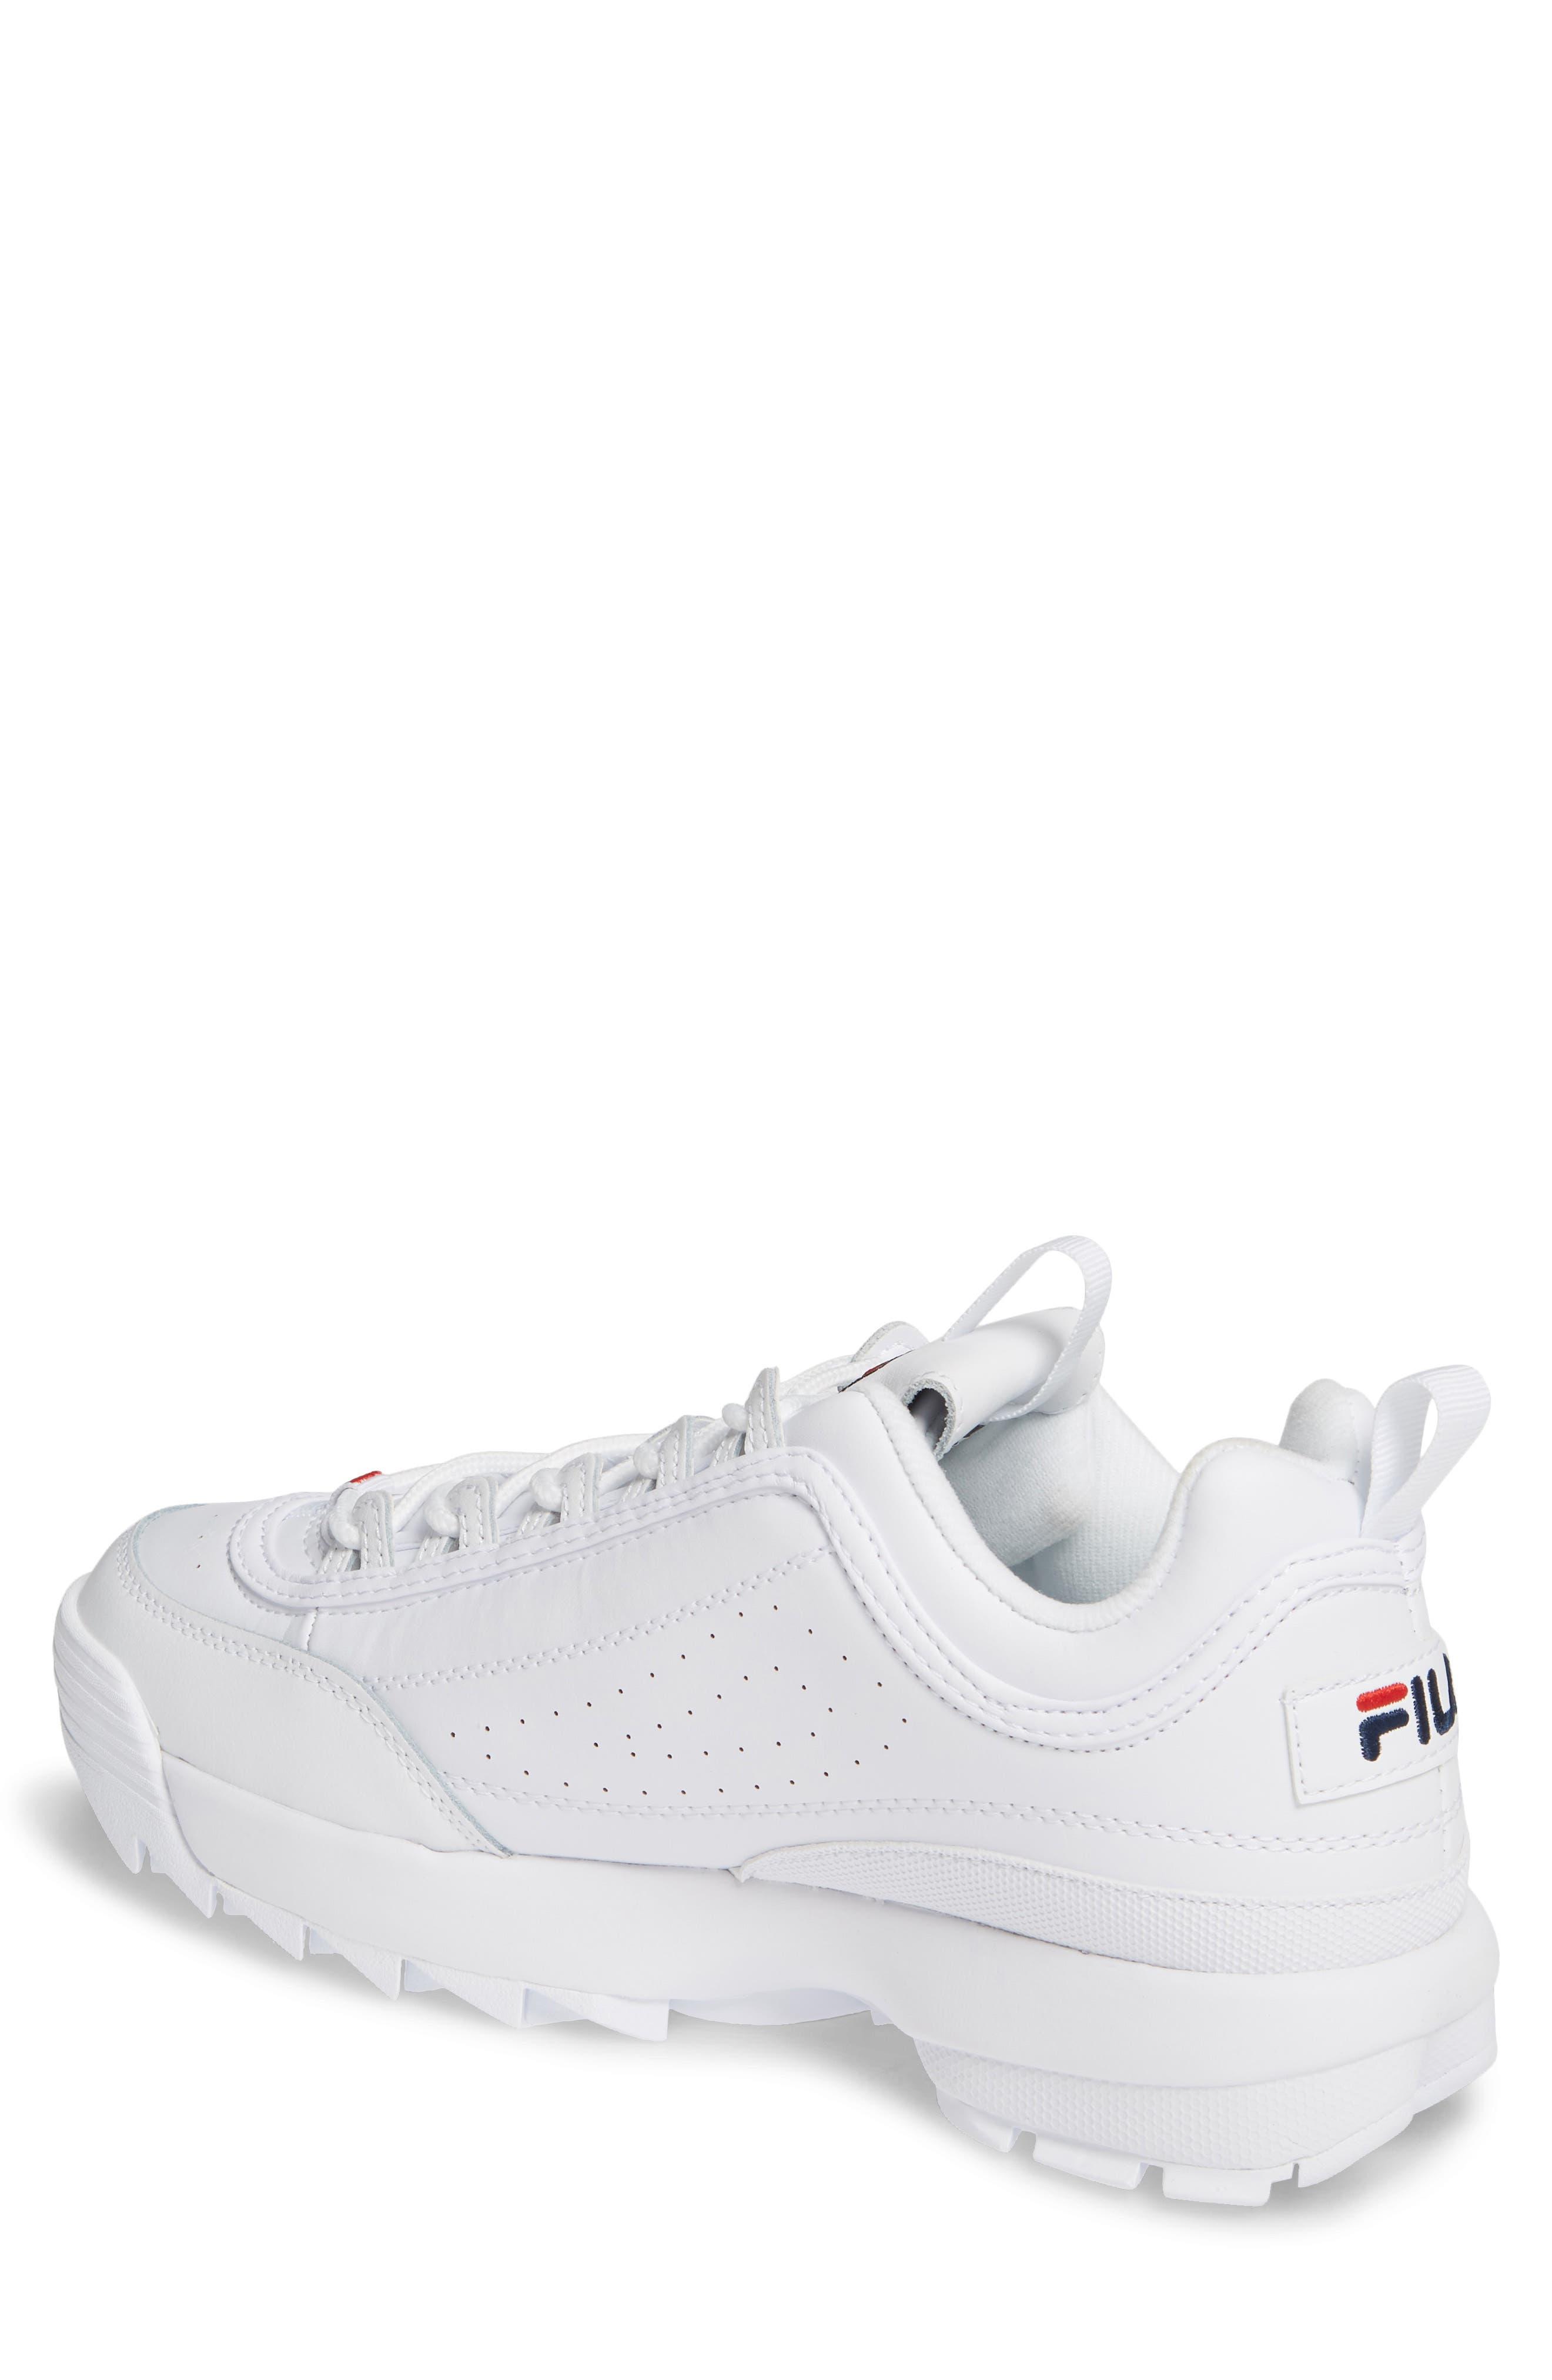 FILA, Disruptor II Premium Sneaker, Alternate thumbnail 2, color, WHITE/ NAVY/ RED